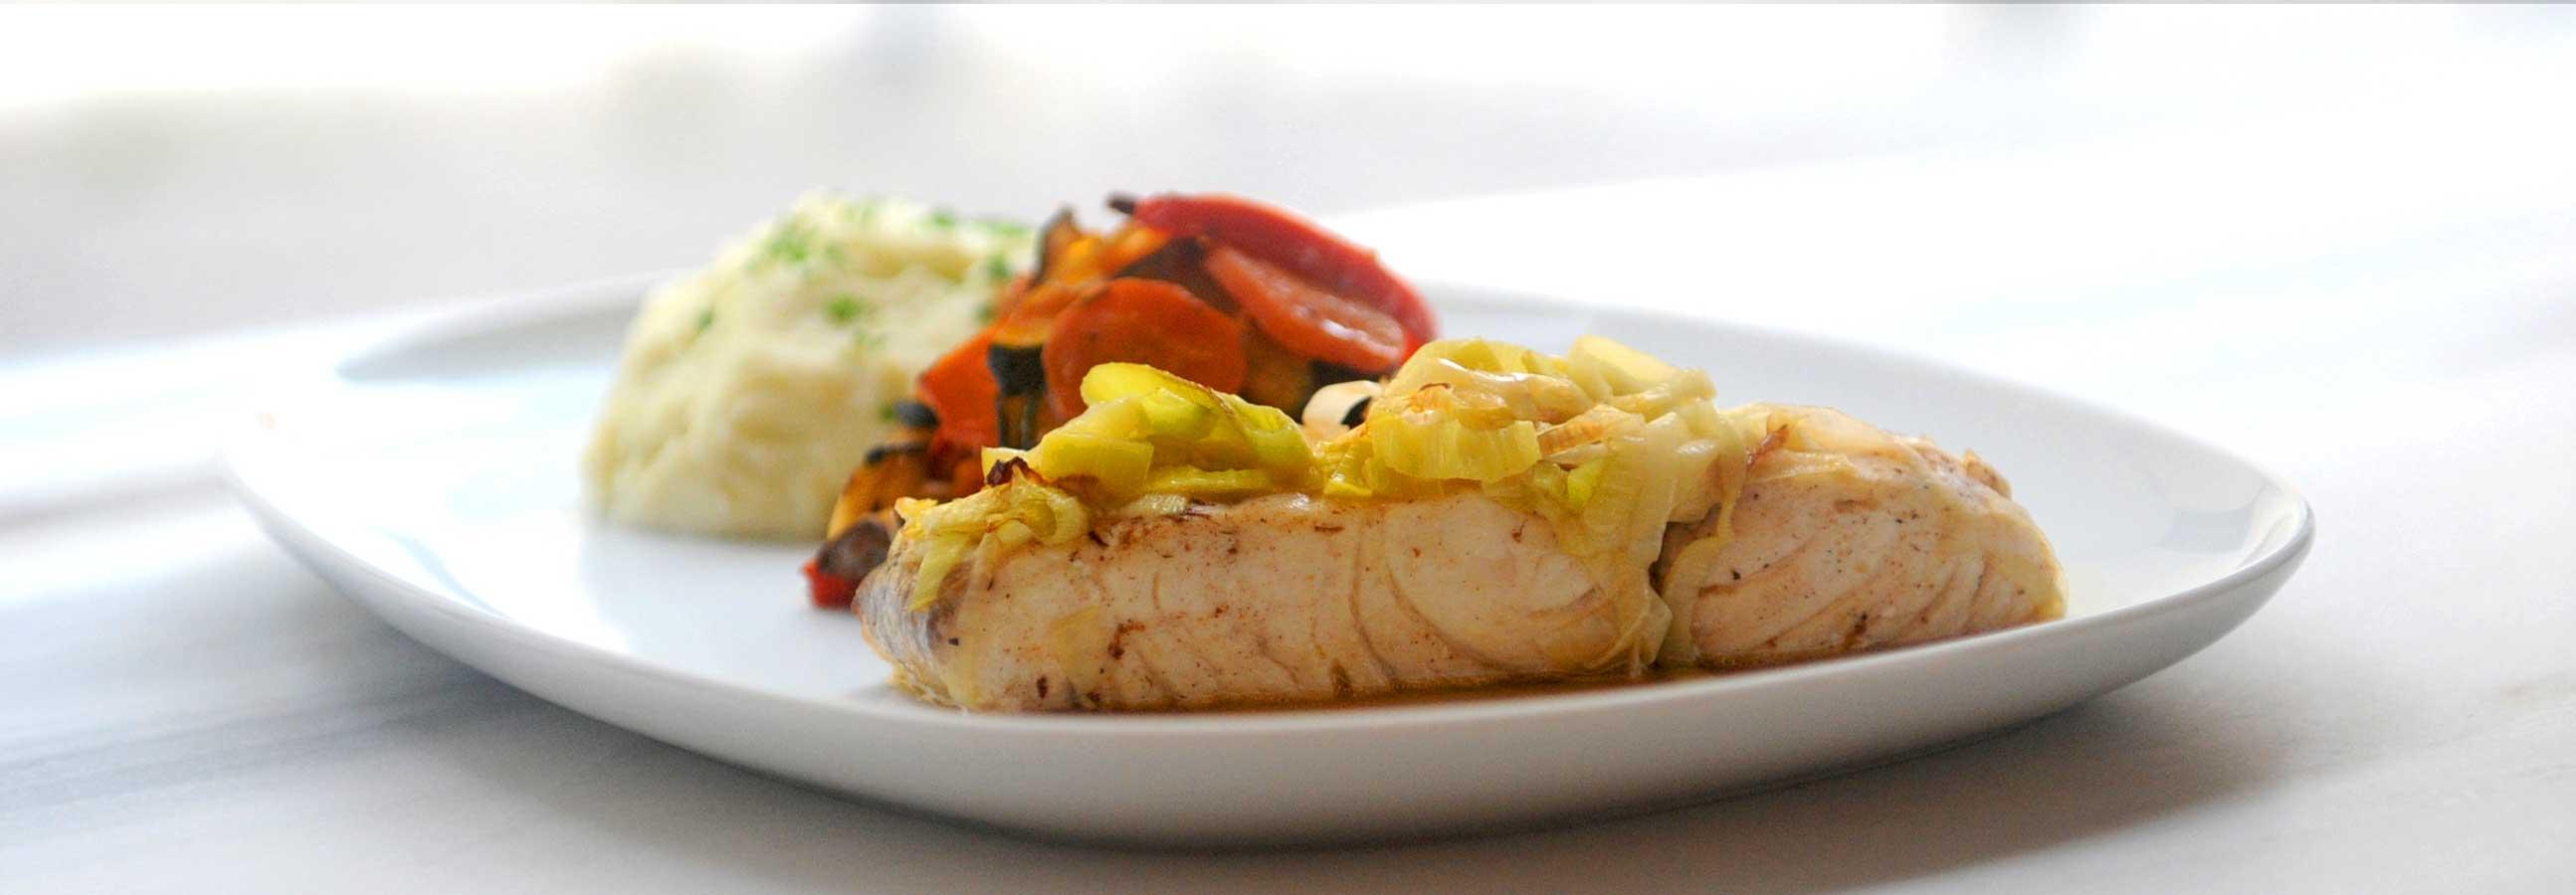 Eatfish-corvina-assada-no-forno